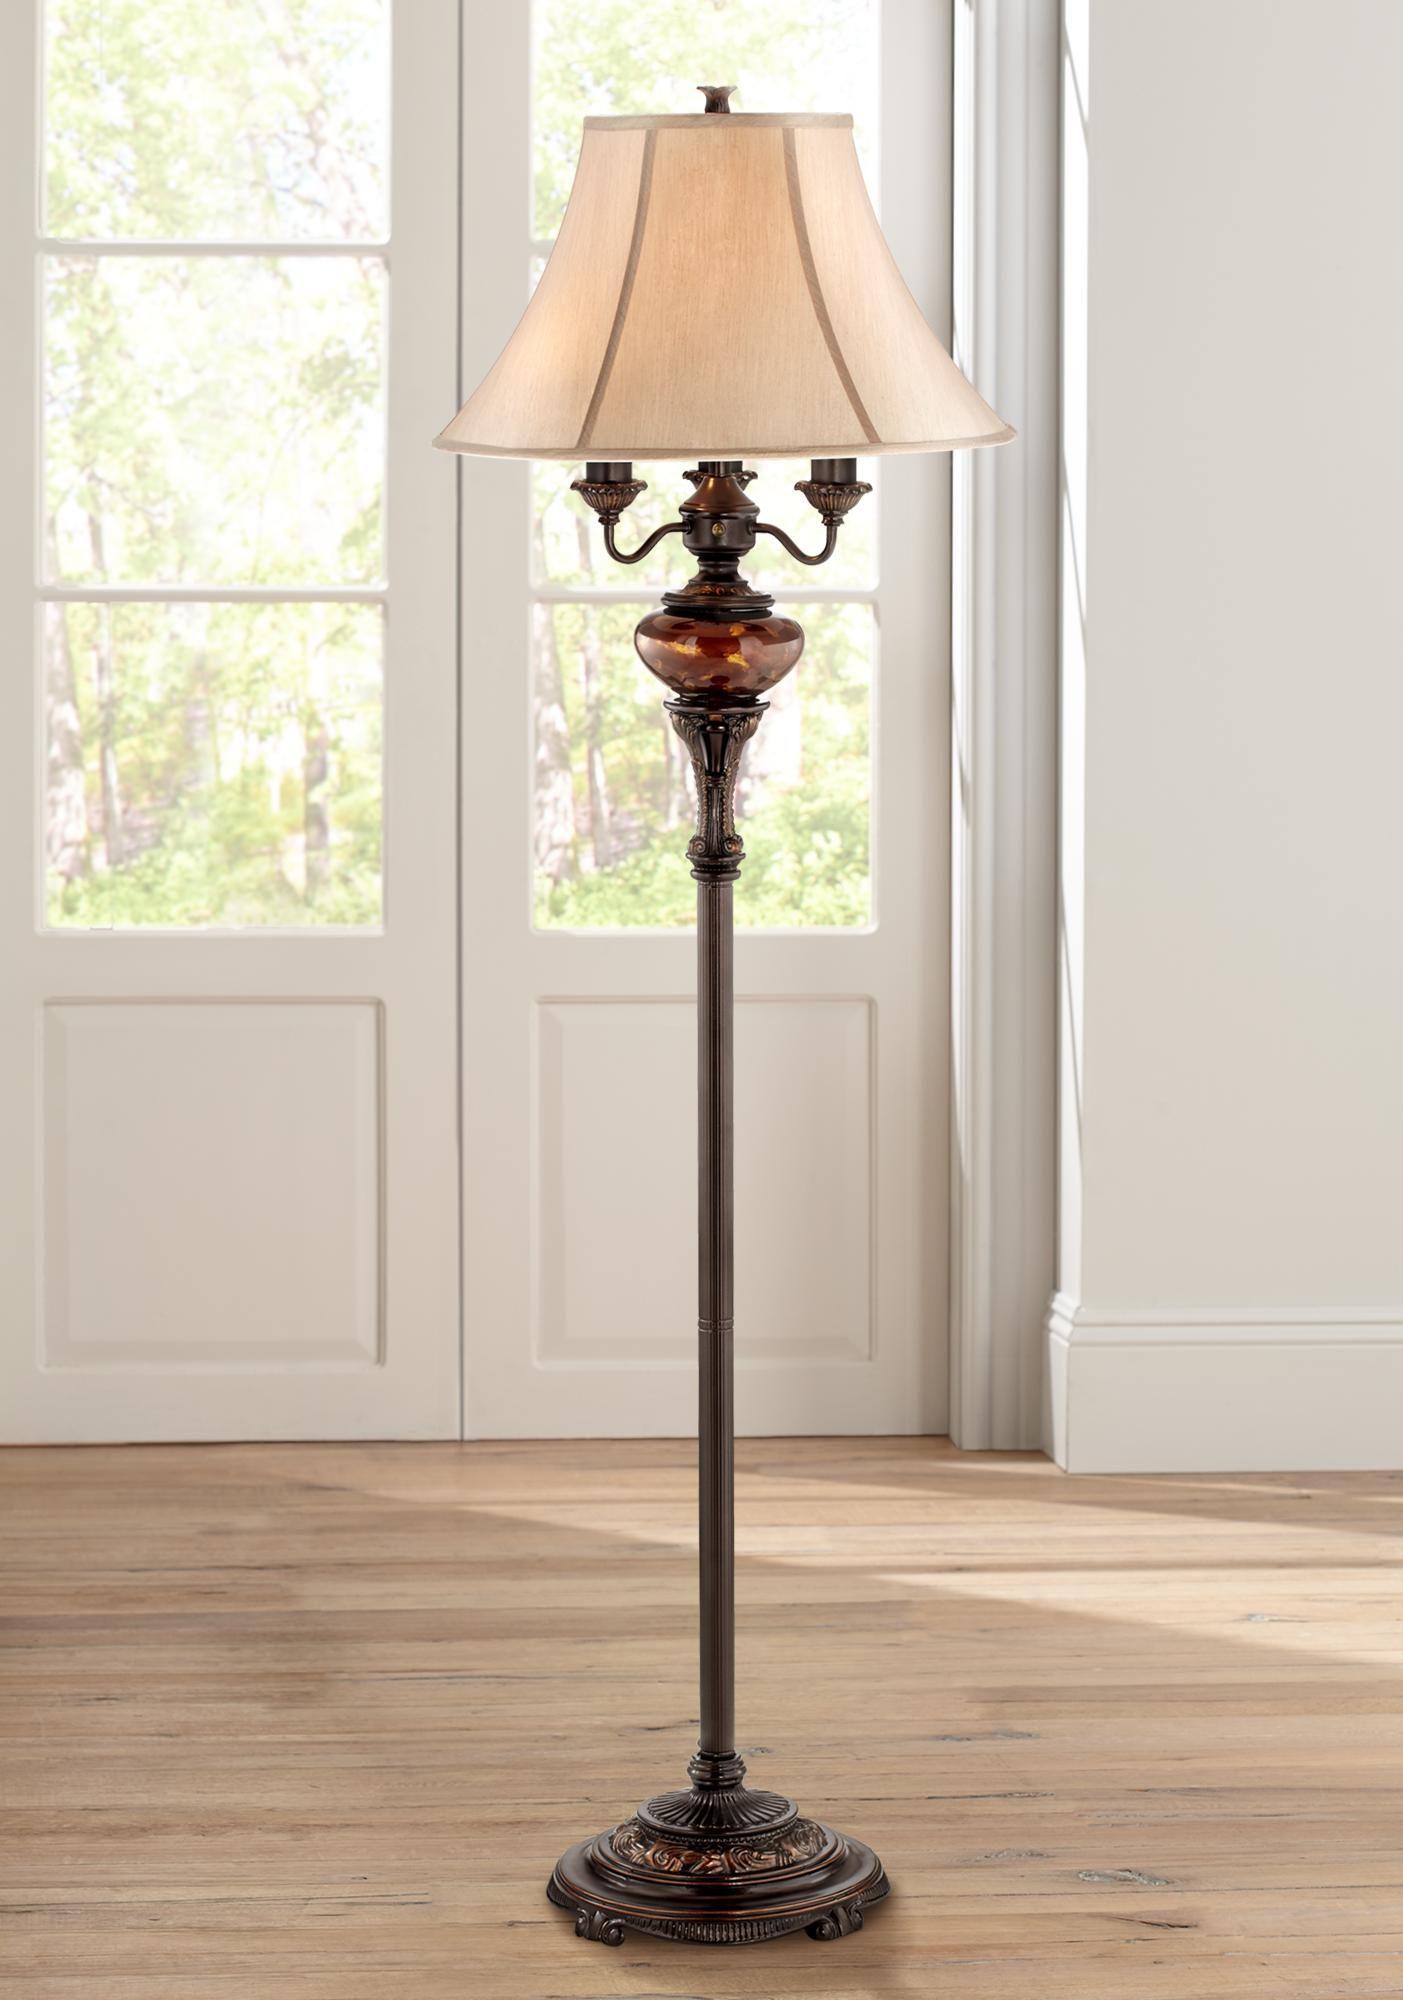 Floor Lamps Bronze Tortoise Shell Font Floor Lamp By Barnes And Ivy In 2020 Traditional Floor Lamps Swing Arm Floor Lamp Bronze Floor Lamp